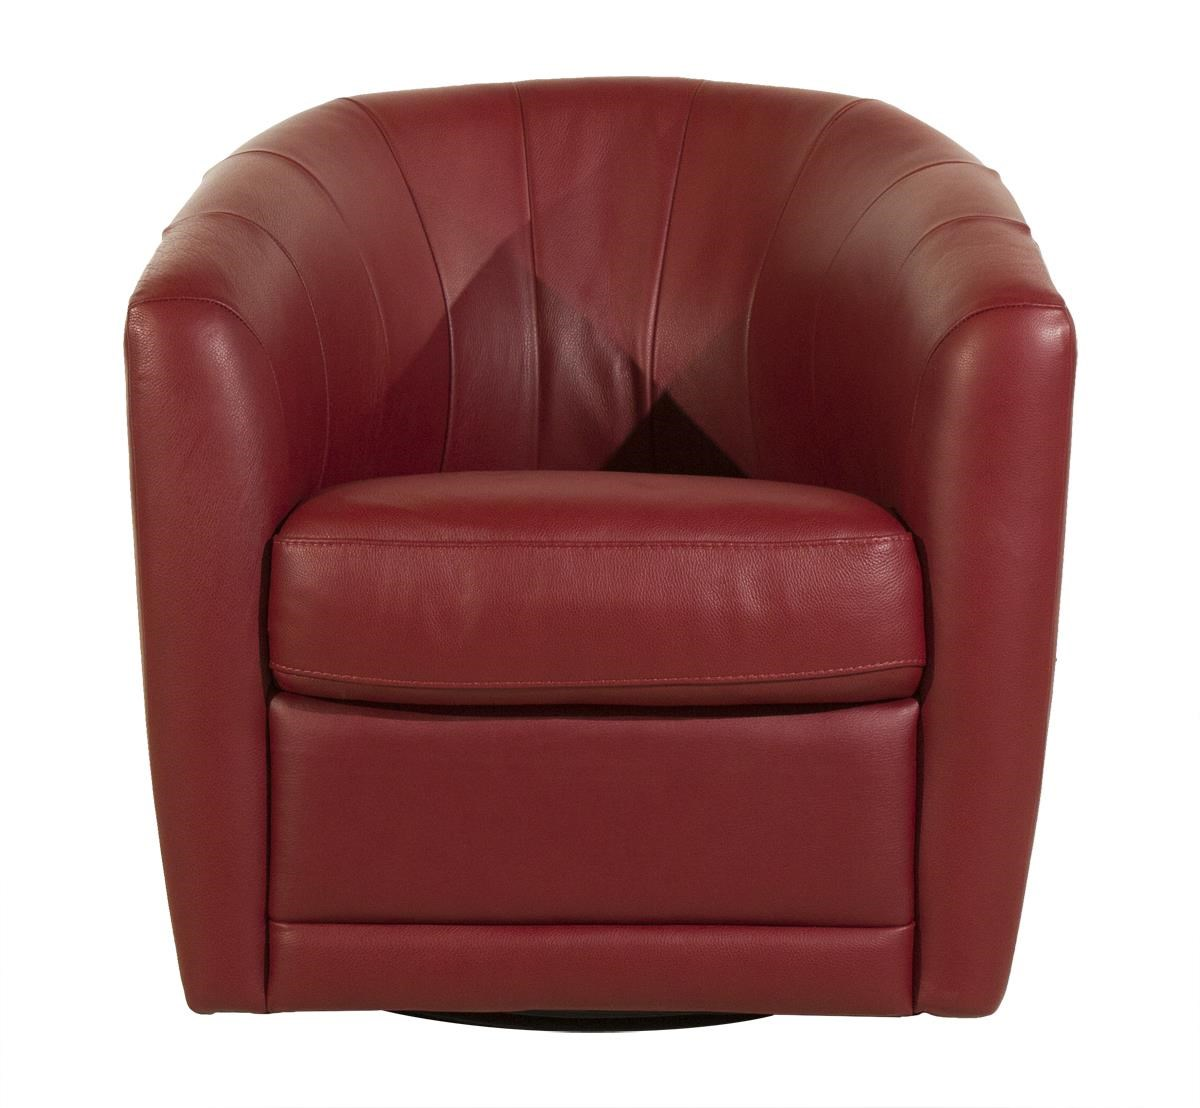 natuzzi swivel chair bar stool editions giada homeworld furniture